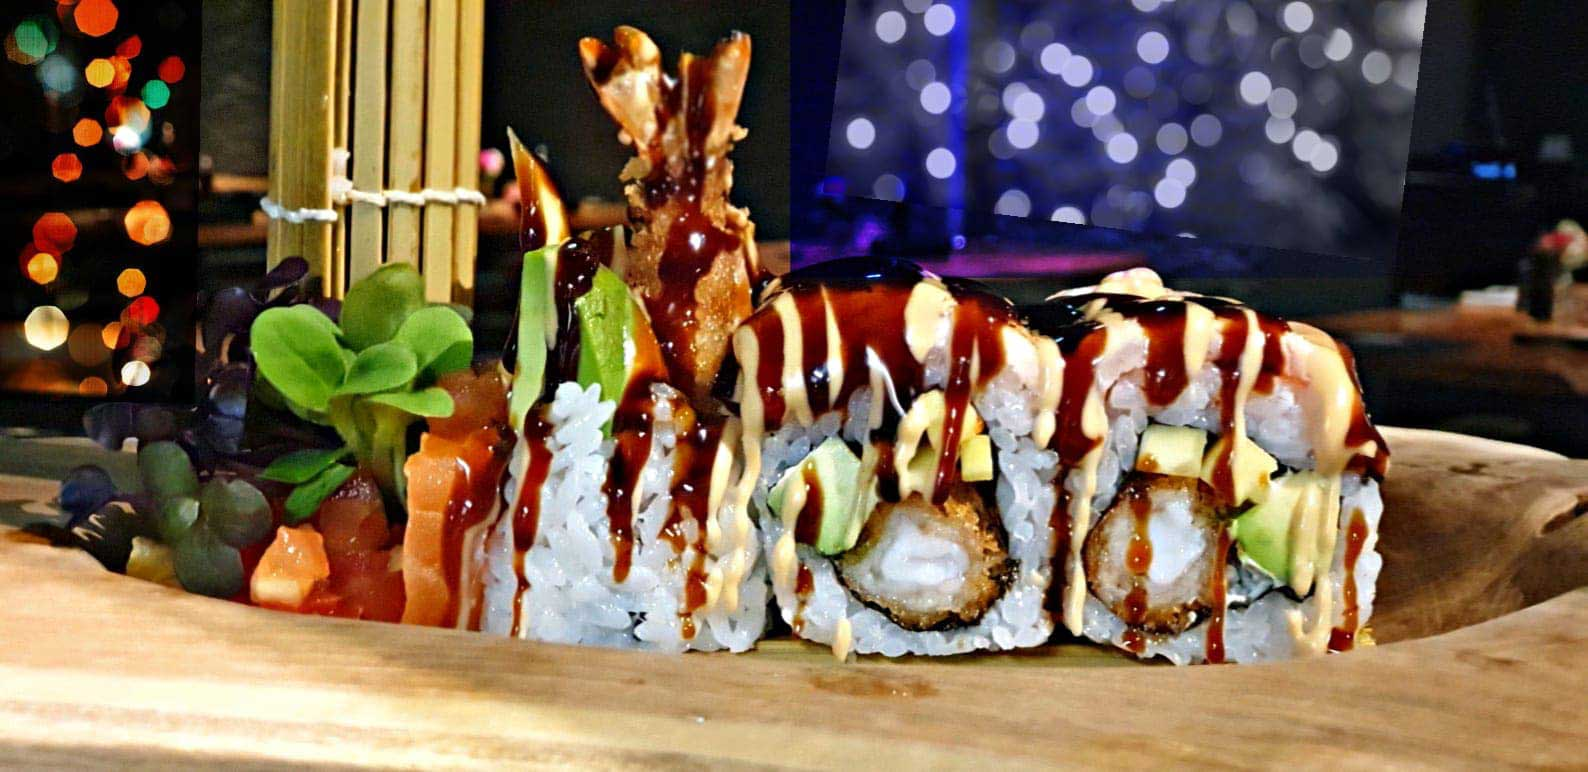 ComMami Sushi Worms - Indochine kitchen & Sushi bar